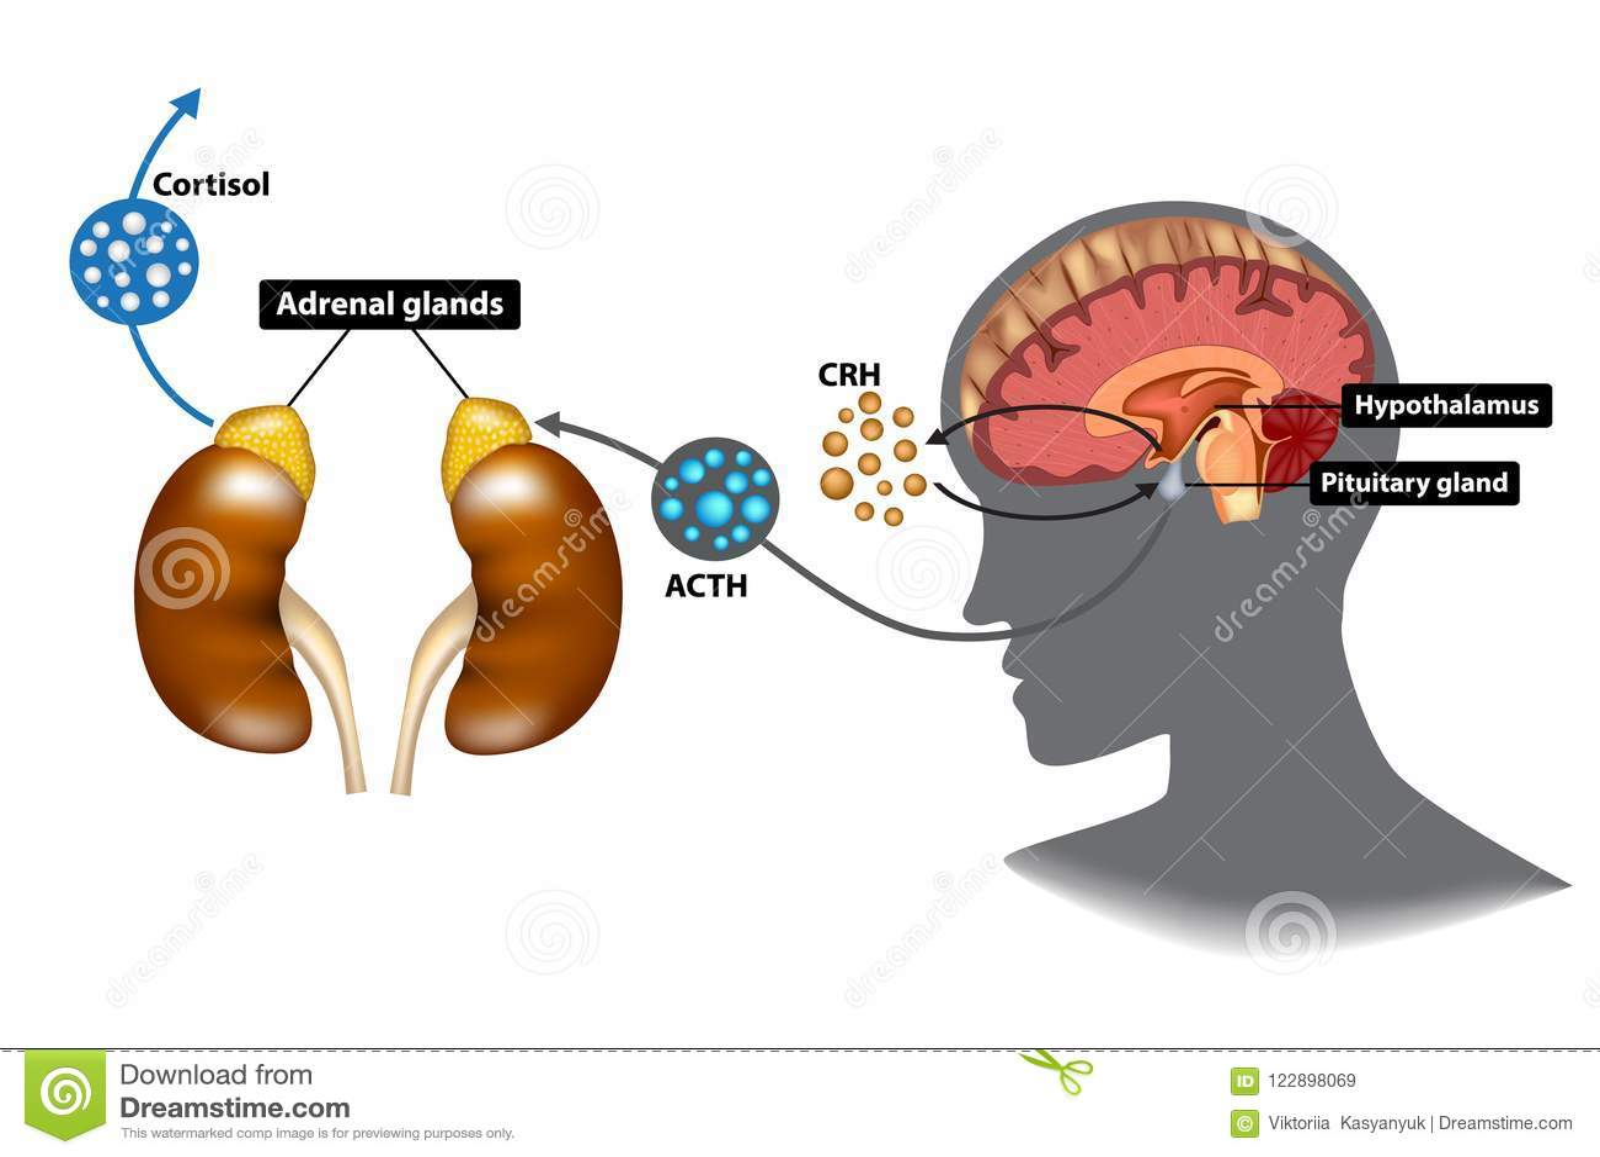 hypothalamic